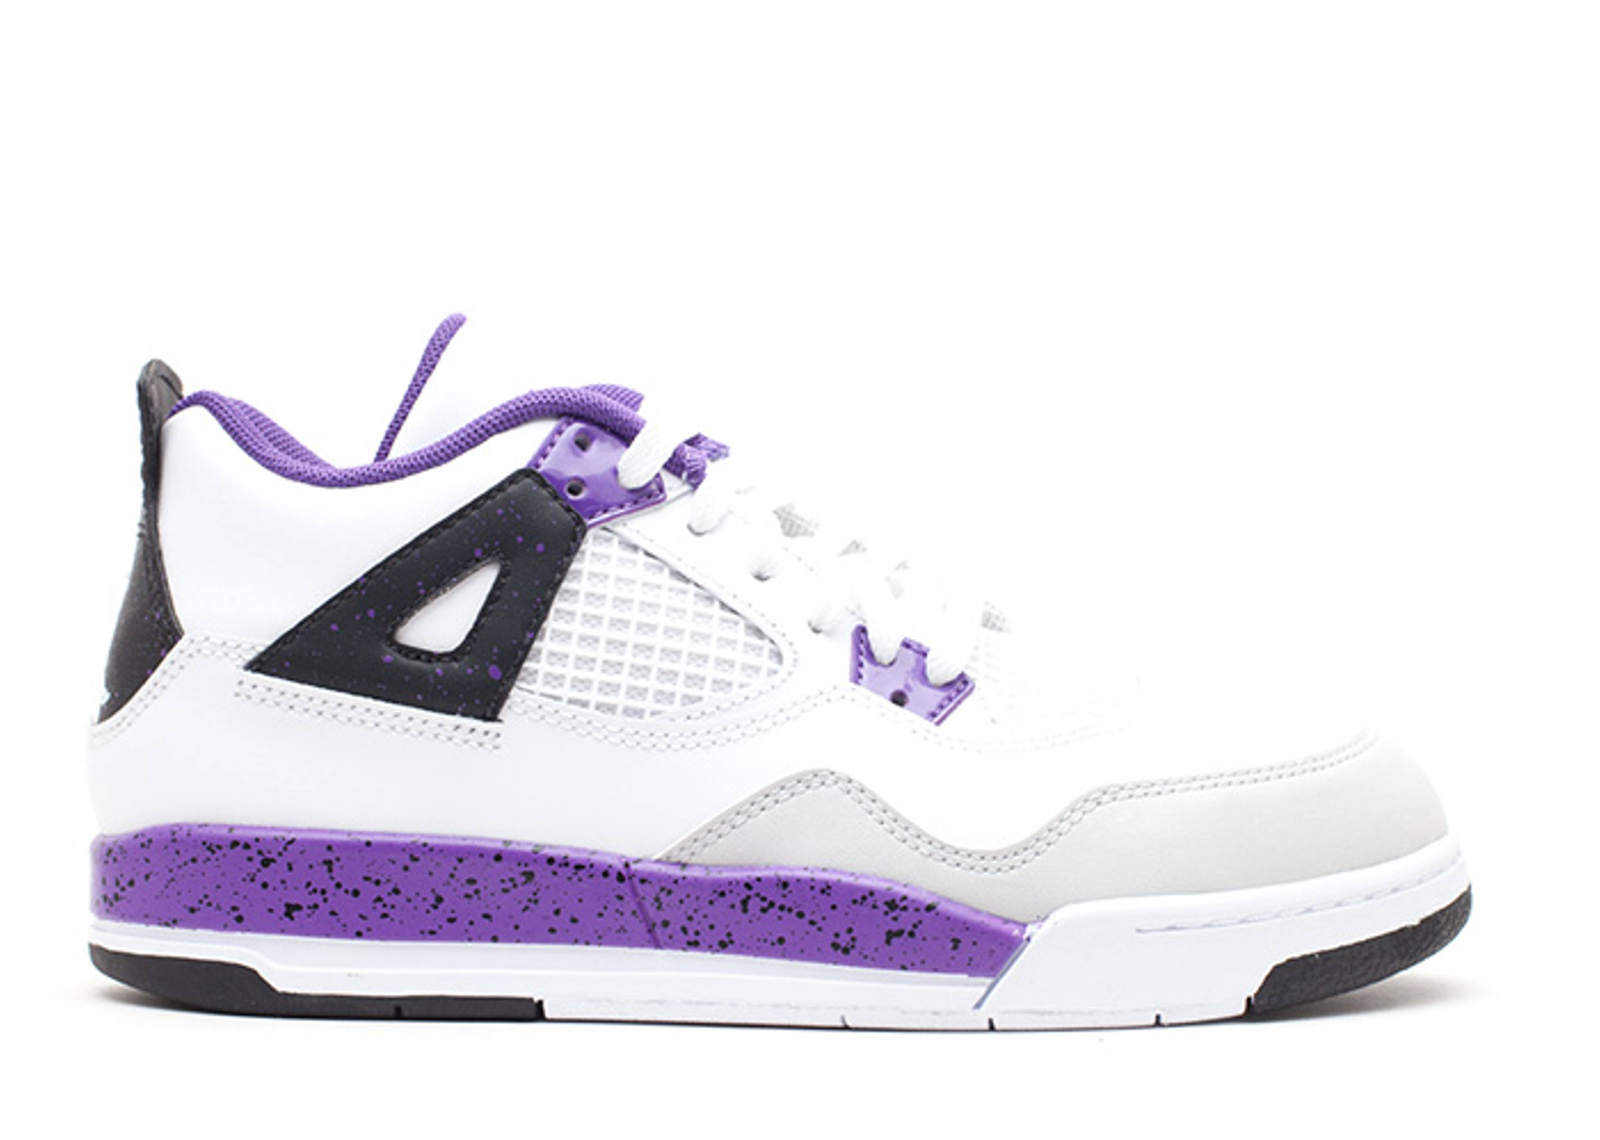 20390a7e00d Girls Jordan 4 Retro Ps - Air Jordan - 487725 108 - white/white-ultraviolet-neutral  grey | Flight Club